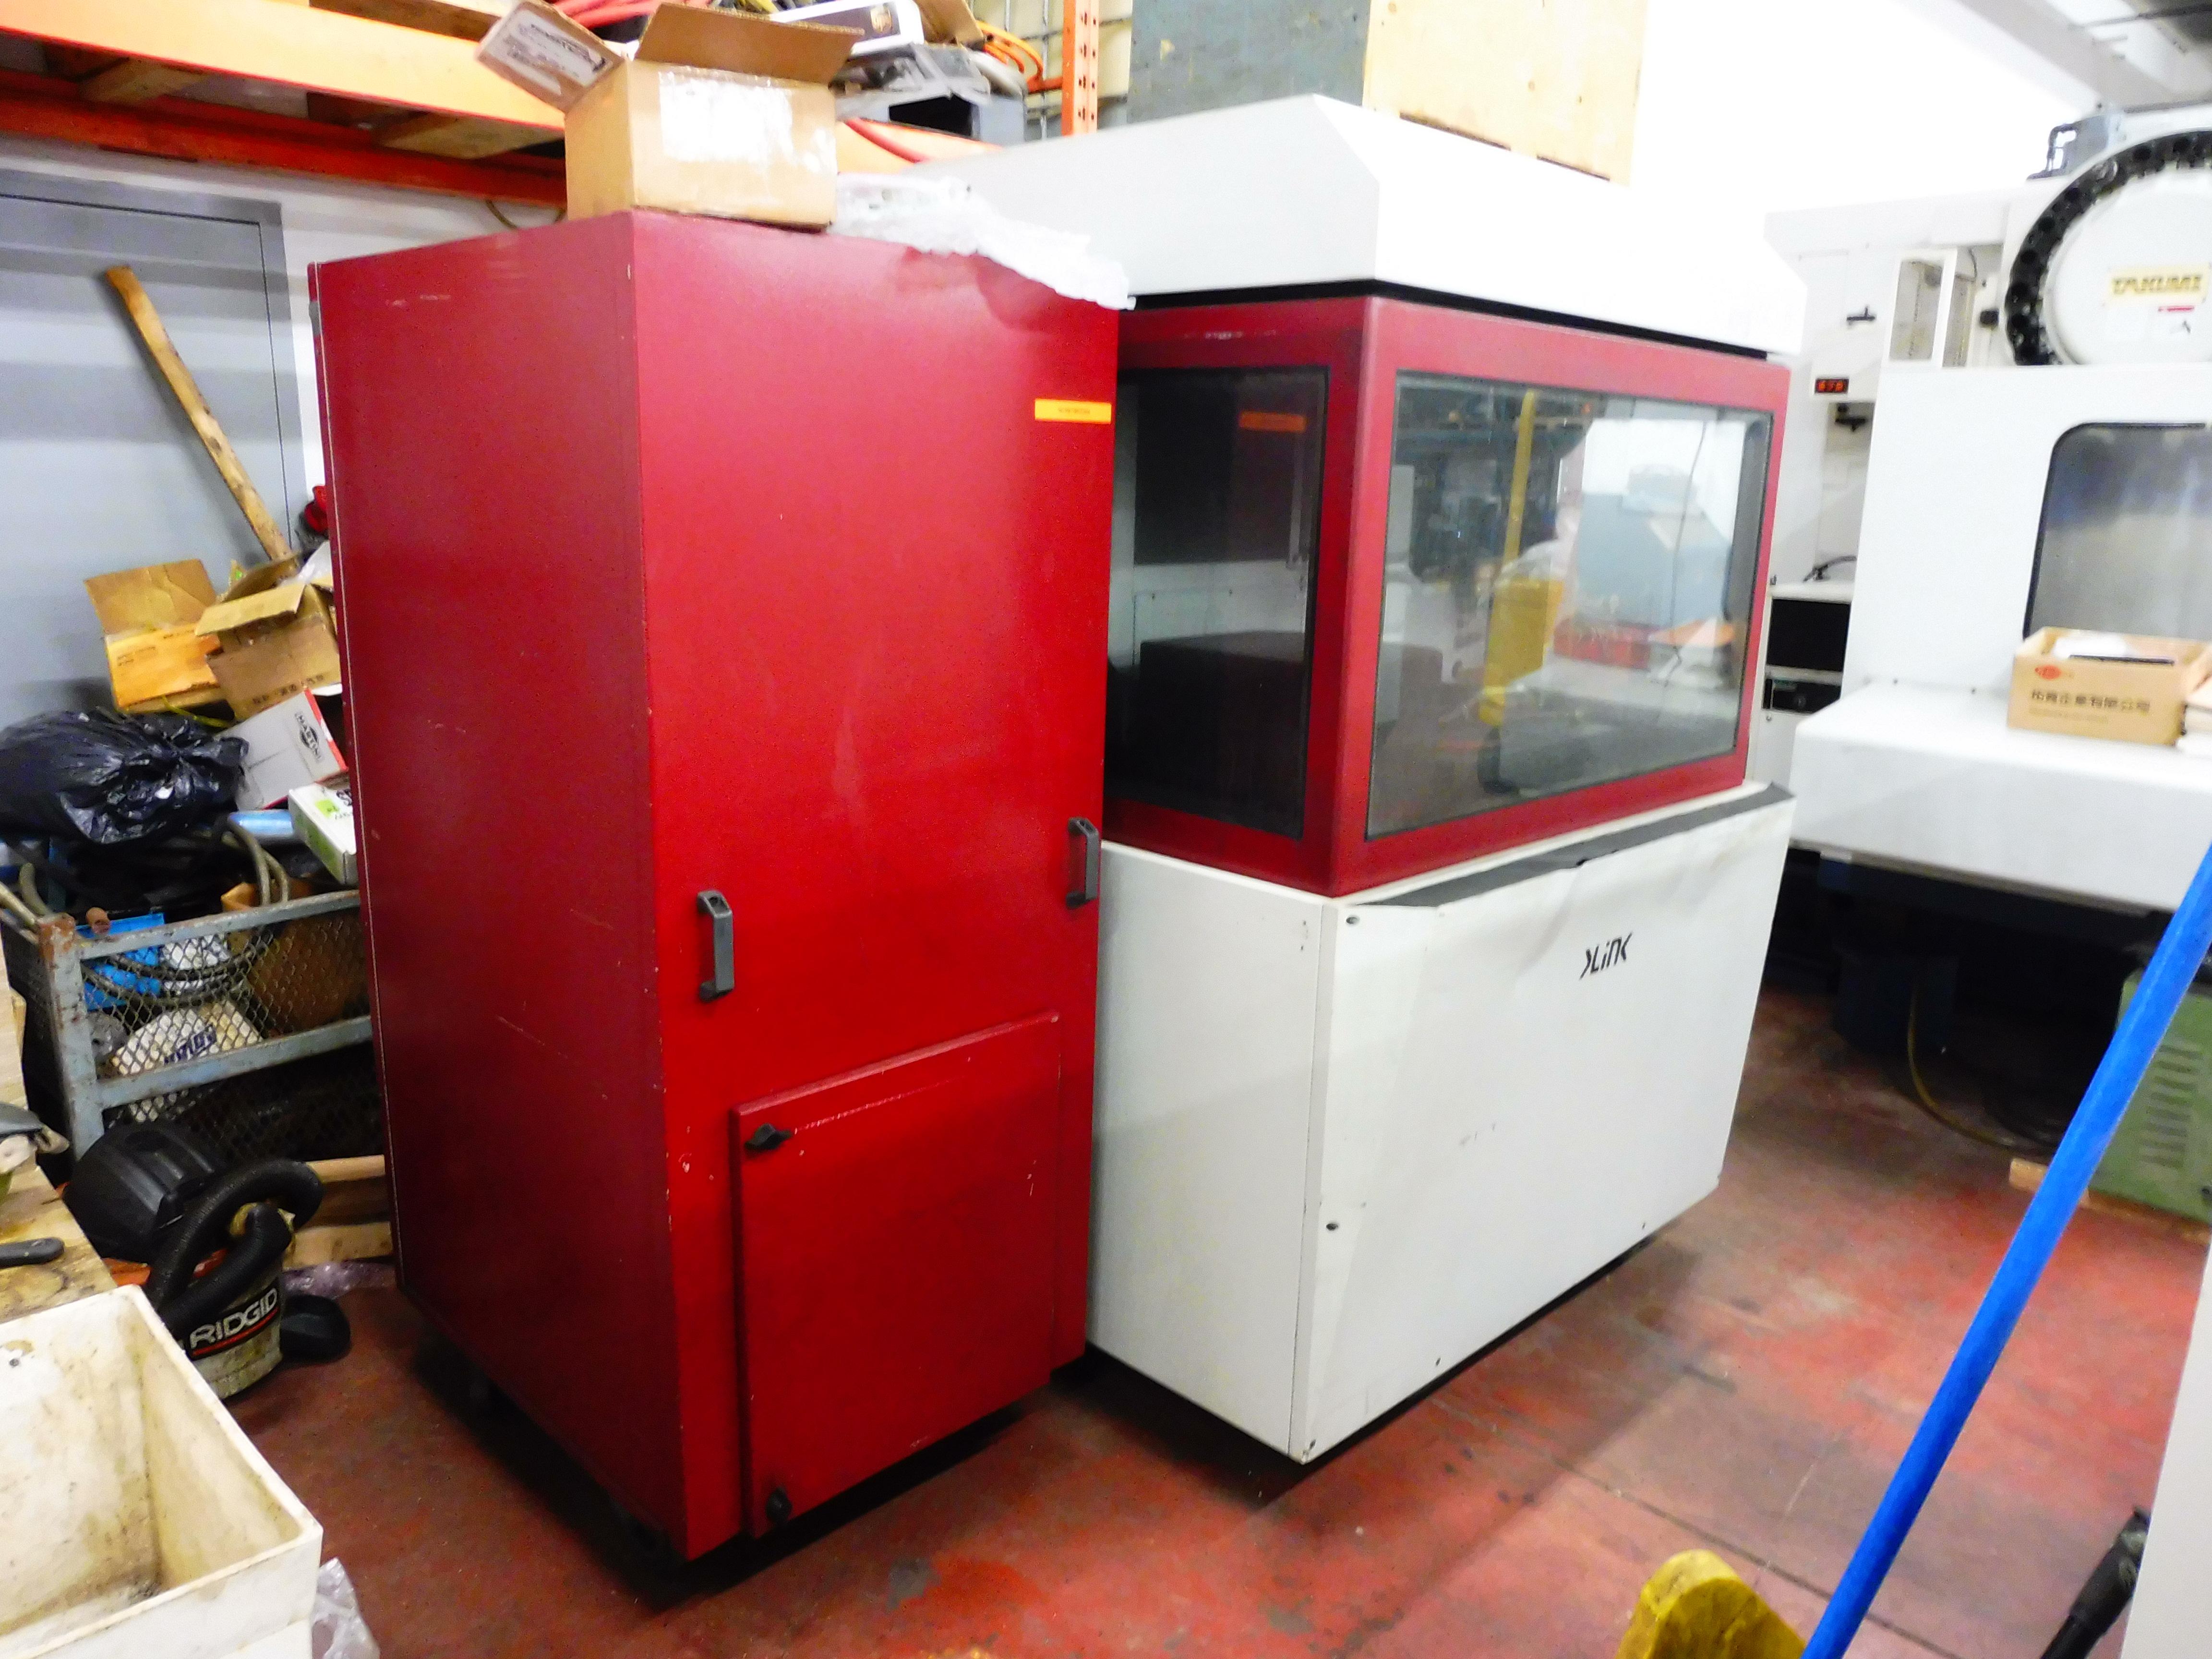 Lot 2 - 1996 KLINK MODEL HSC60-M HIGH SPEED CNC VERTICAL MACHINING CENTRE, S/N 75210701, WITH SEIMENS